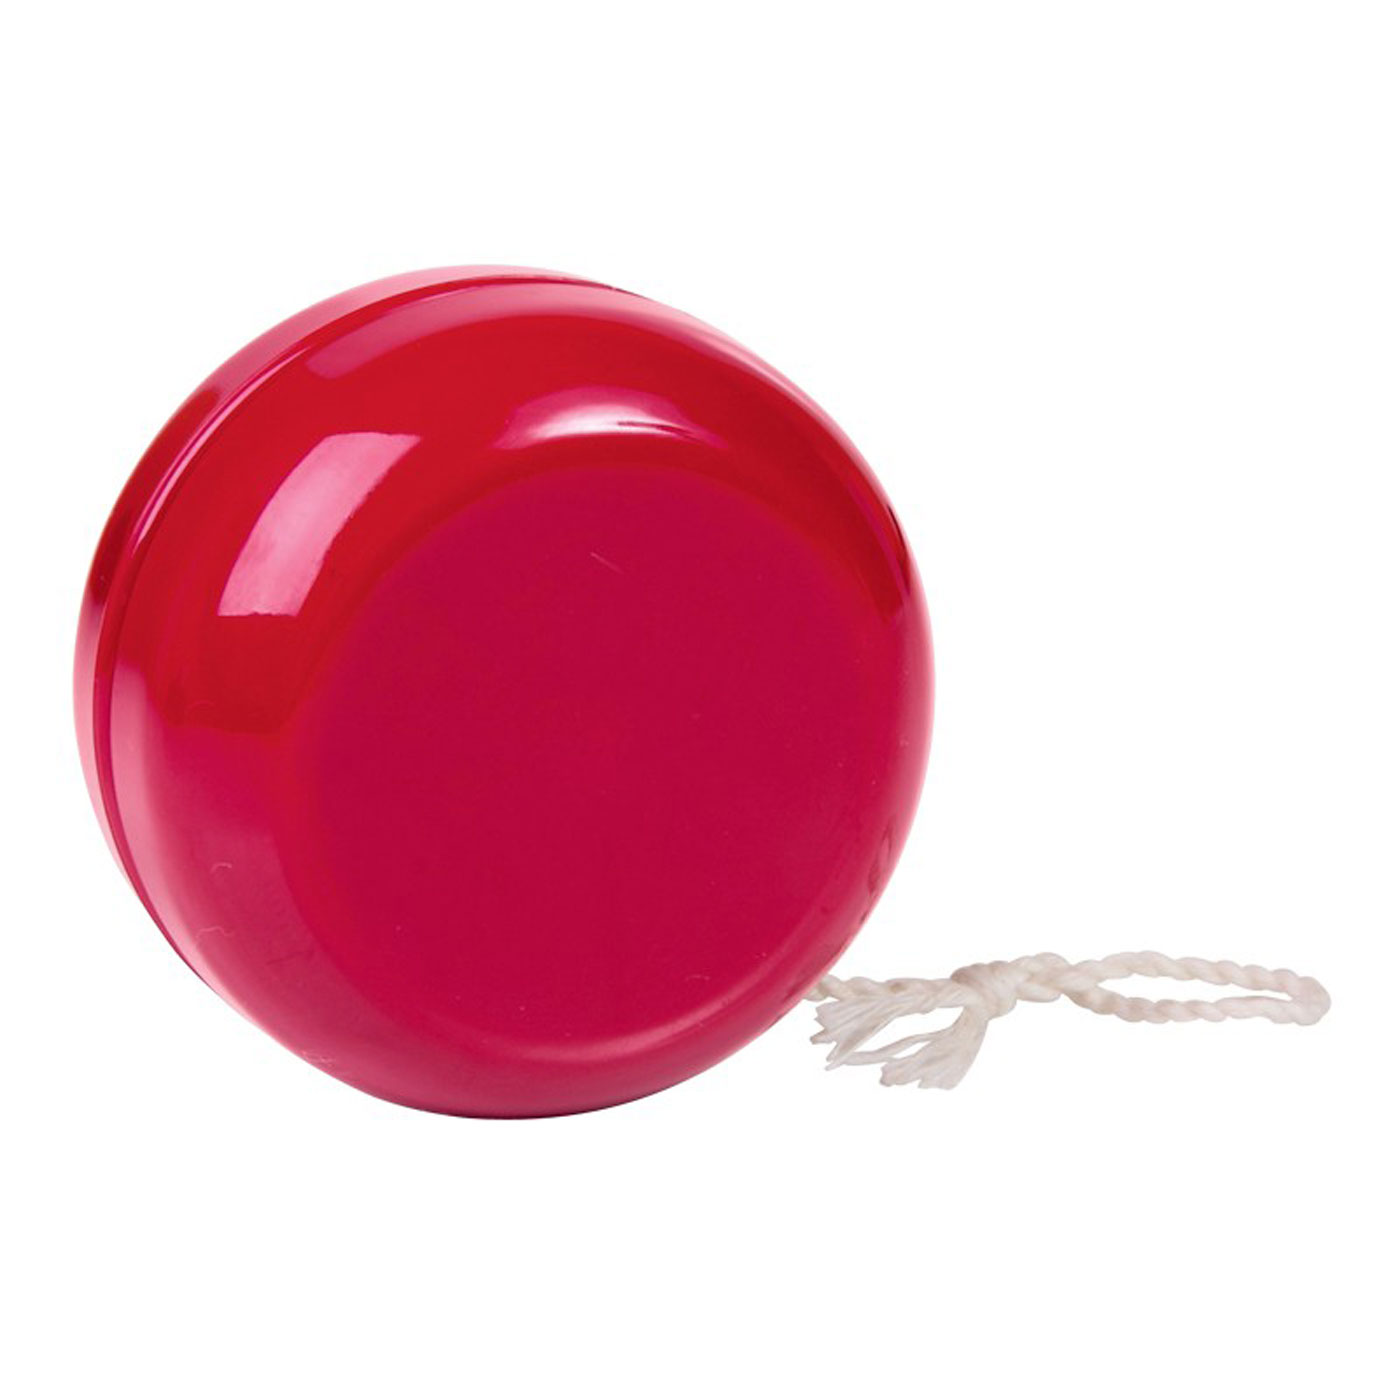 Ty401 red ab prime item 6